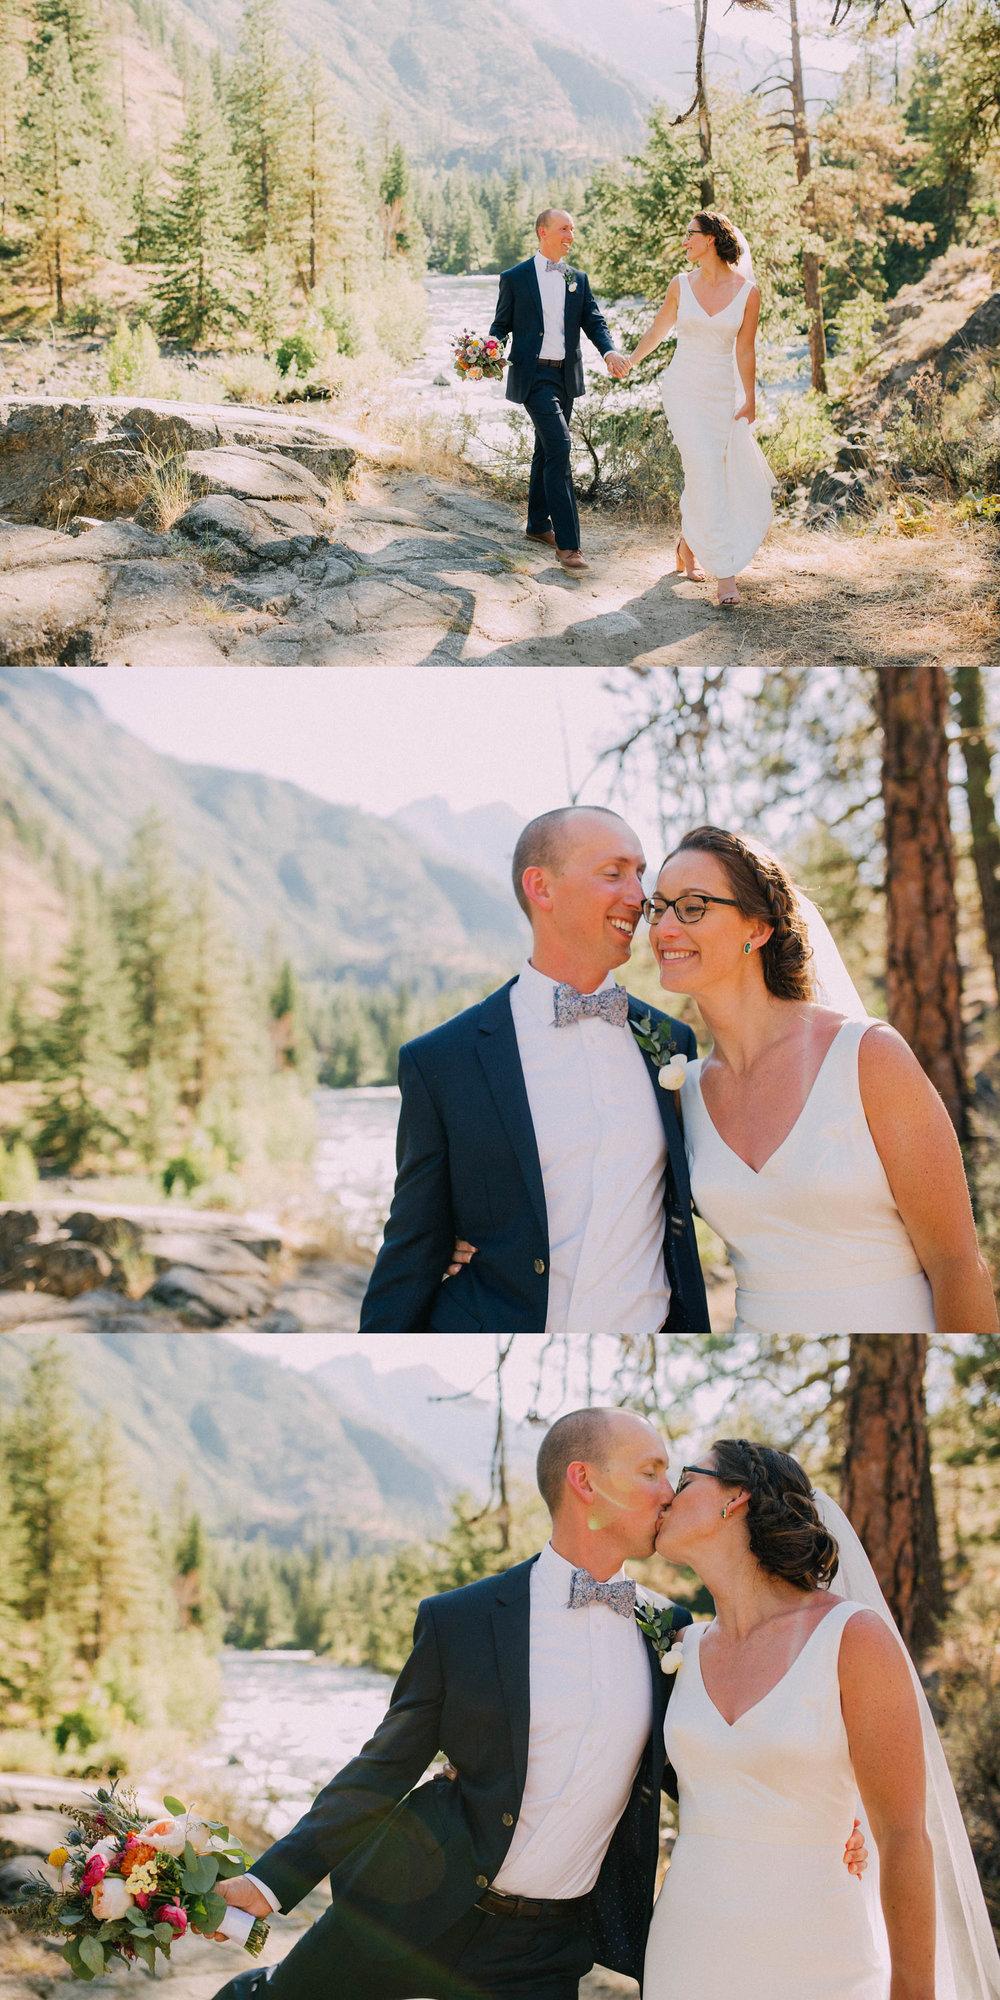 seattle+and+pacific+northwest+wedding+photographer+western+washington+wedding-16.jpg